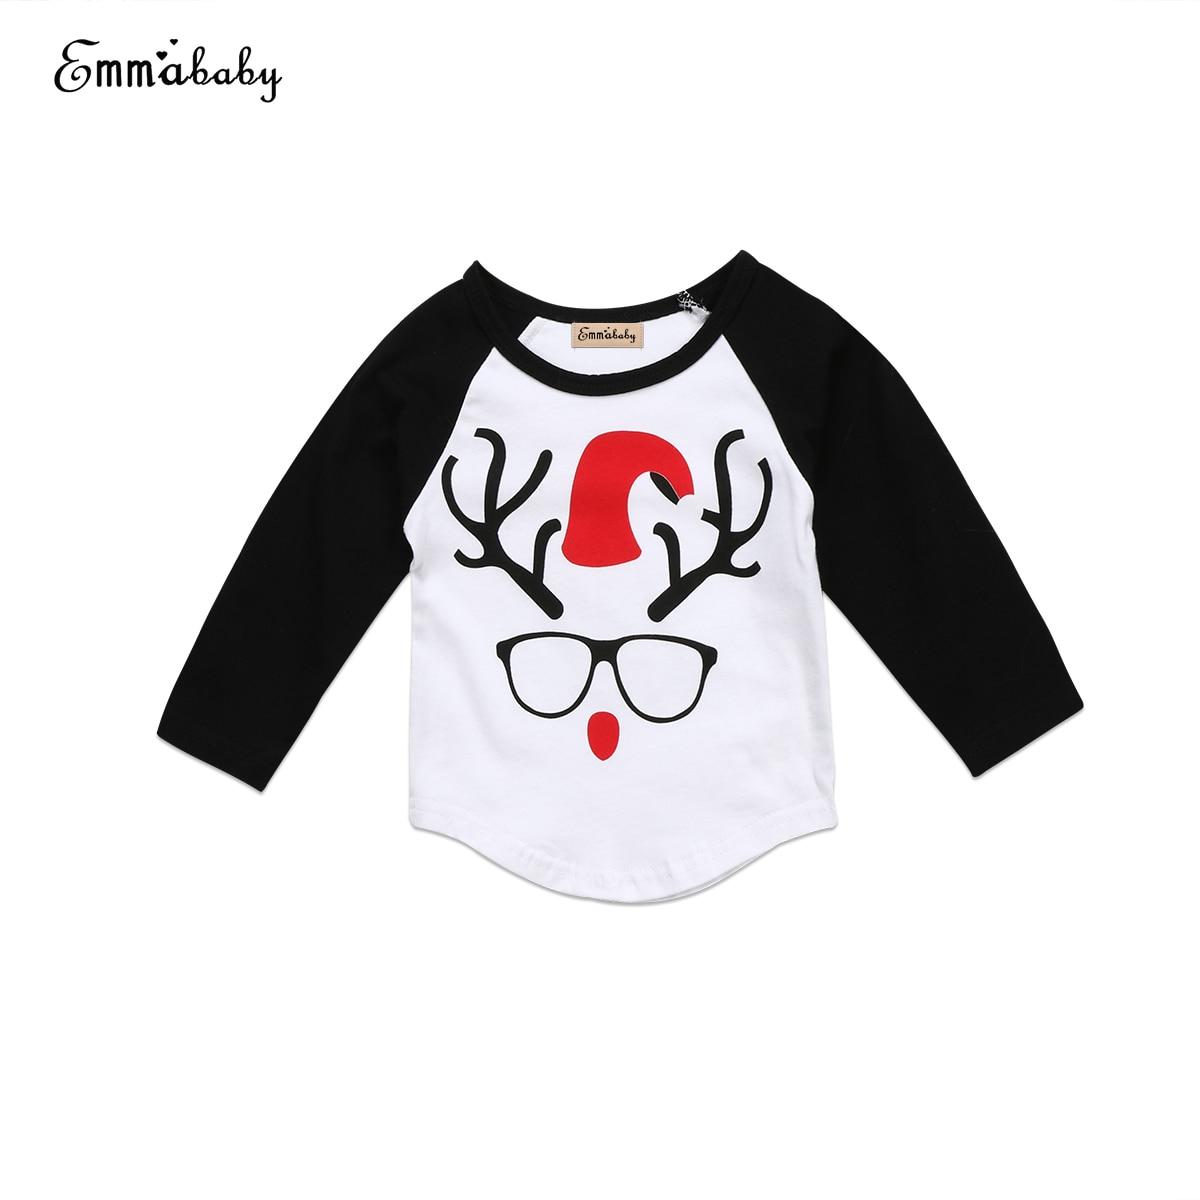 T-Shirt Tees Reindeer Christmas Newborn-Baby Boy Cotton Kid Xmas Tops Glasss-Printing